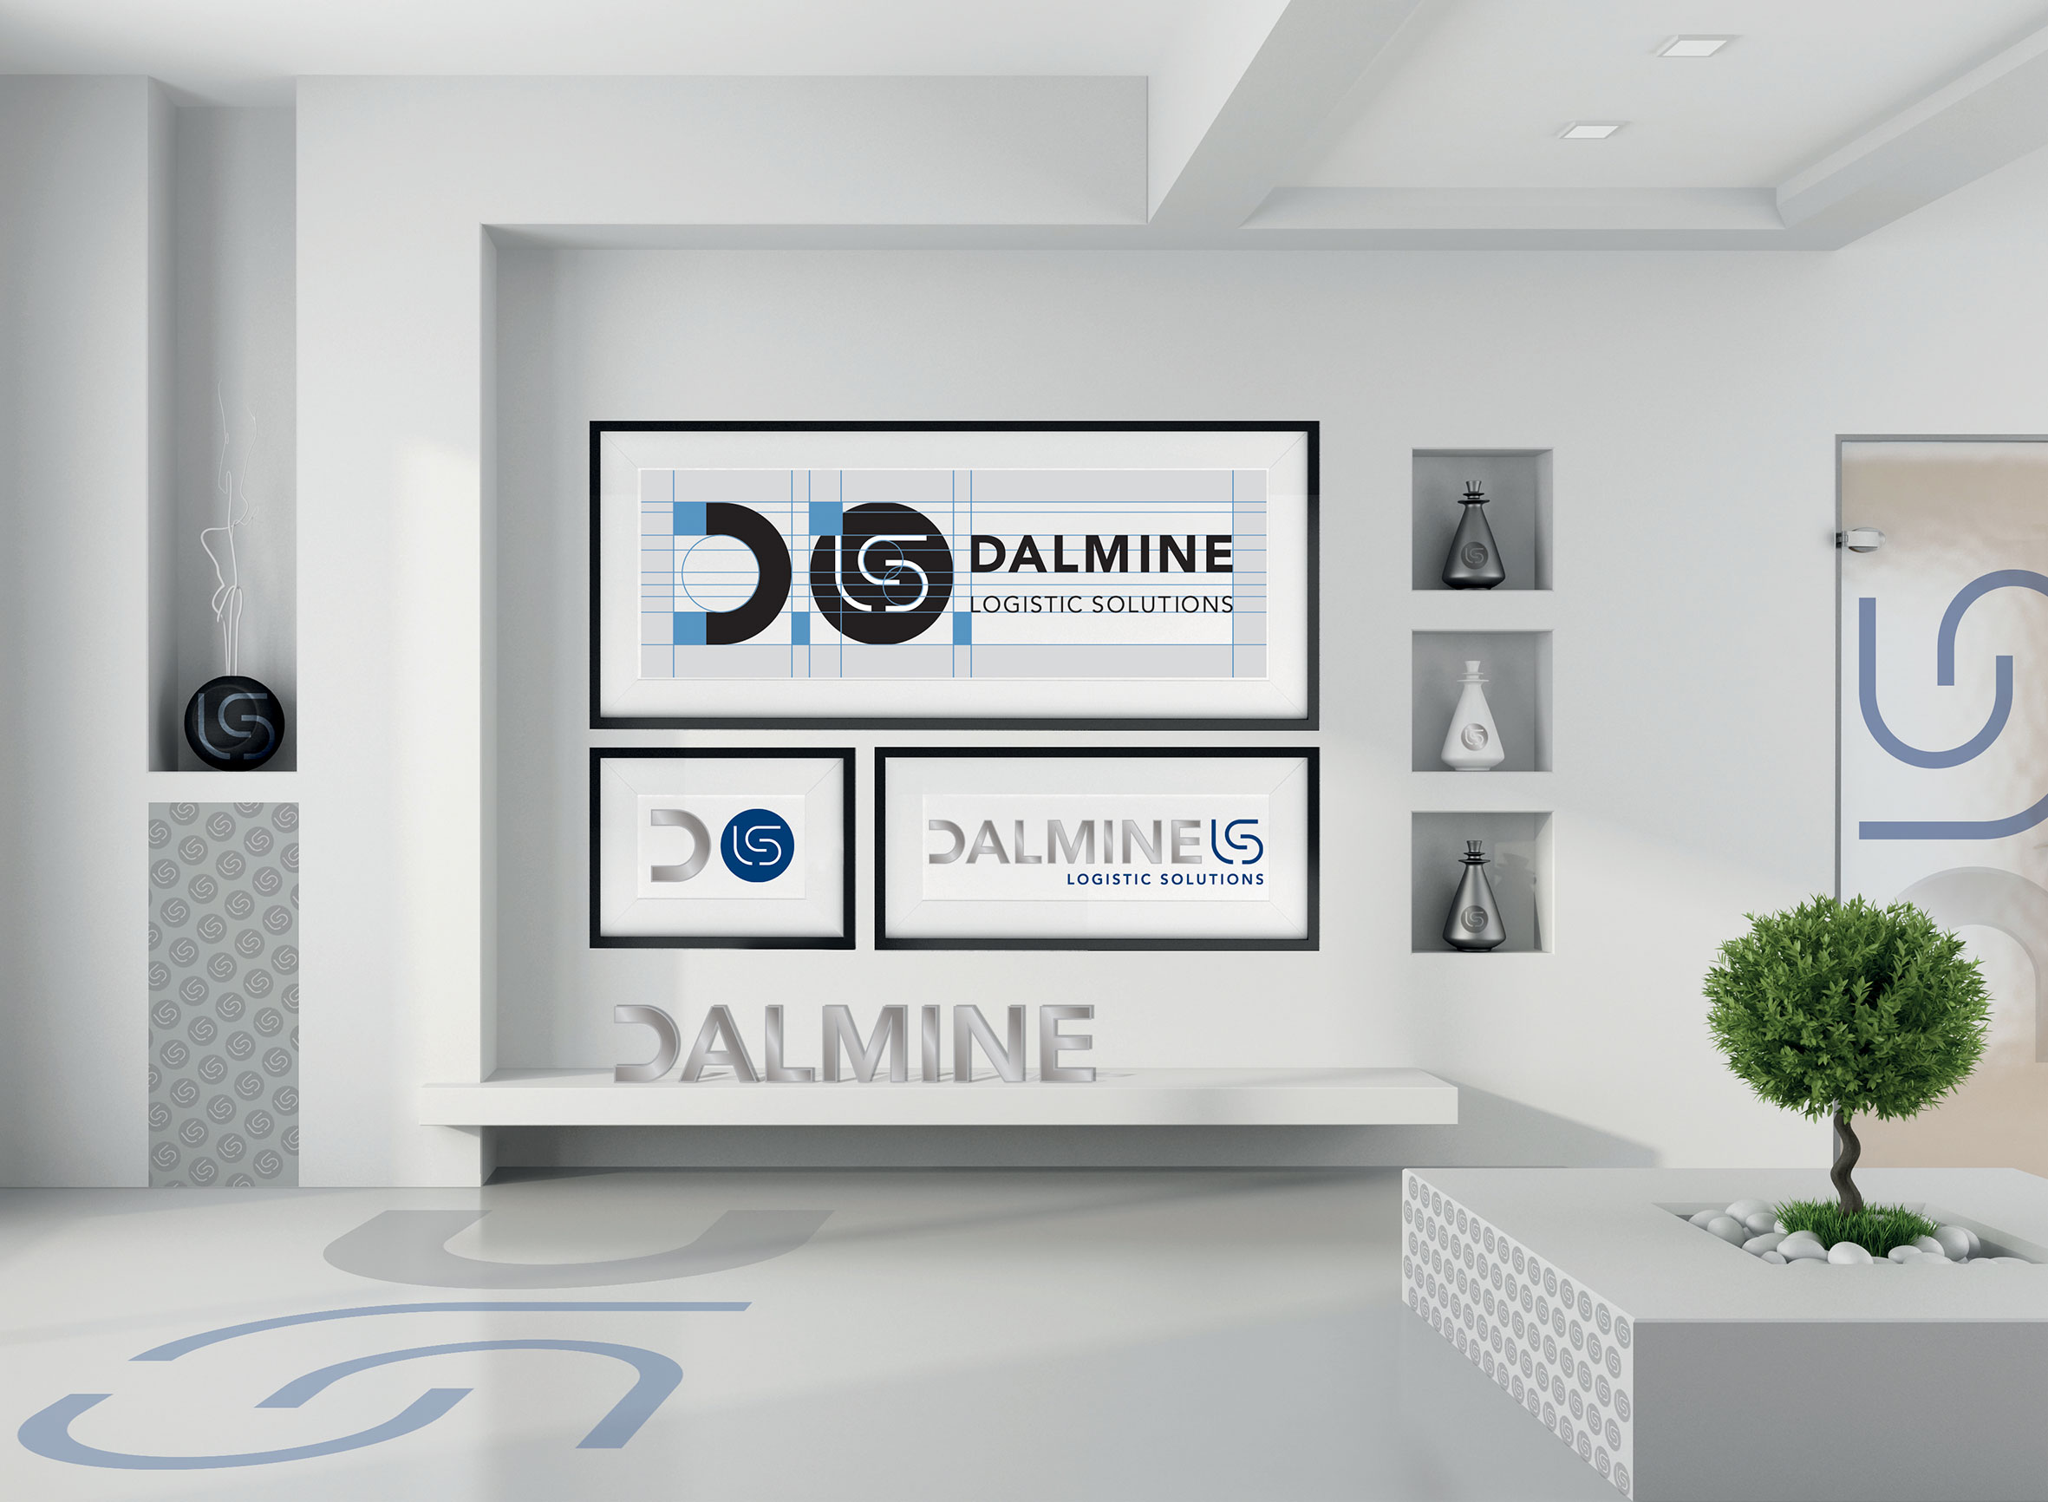 SC-Studio-Chiesa-Communication_Logistica-DLS-Dalmine-Logistic-Solutions-logo